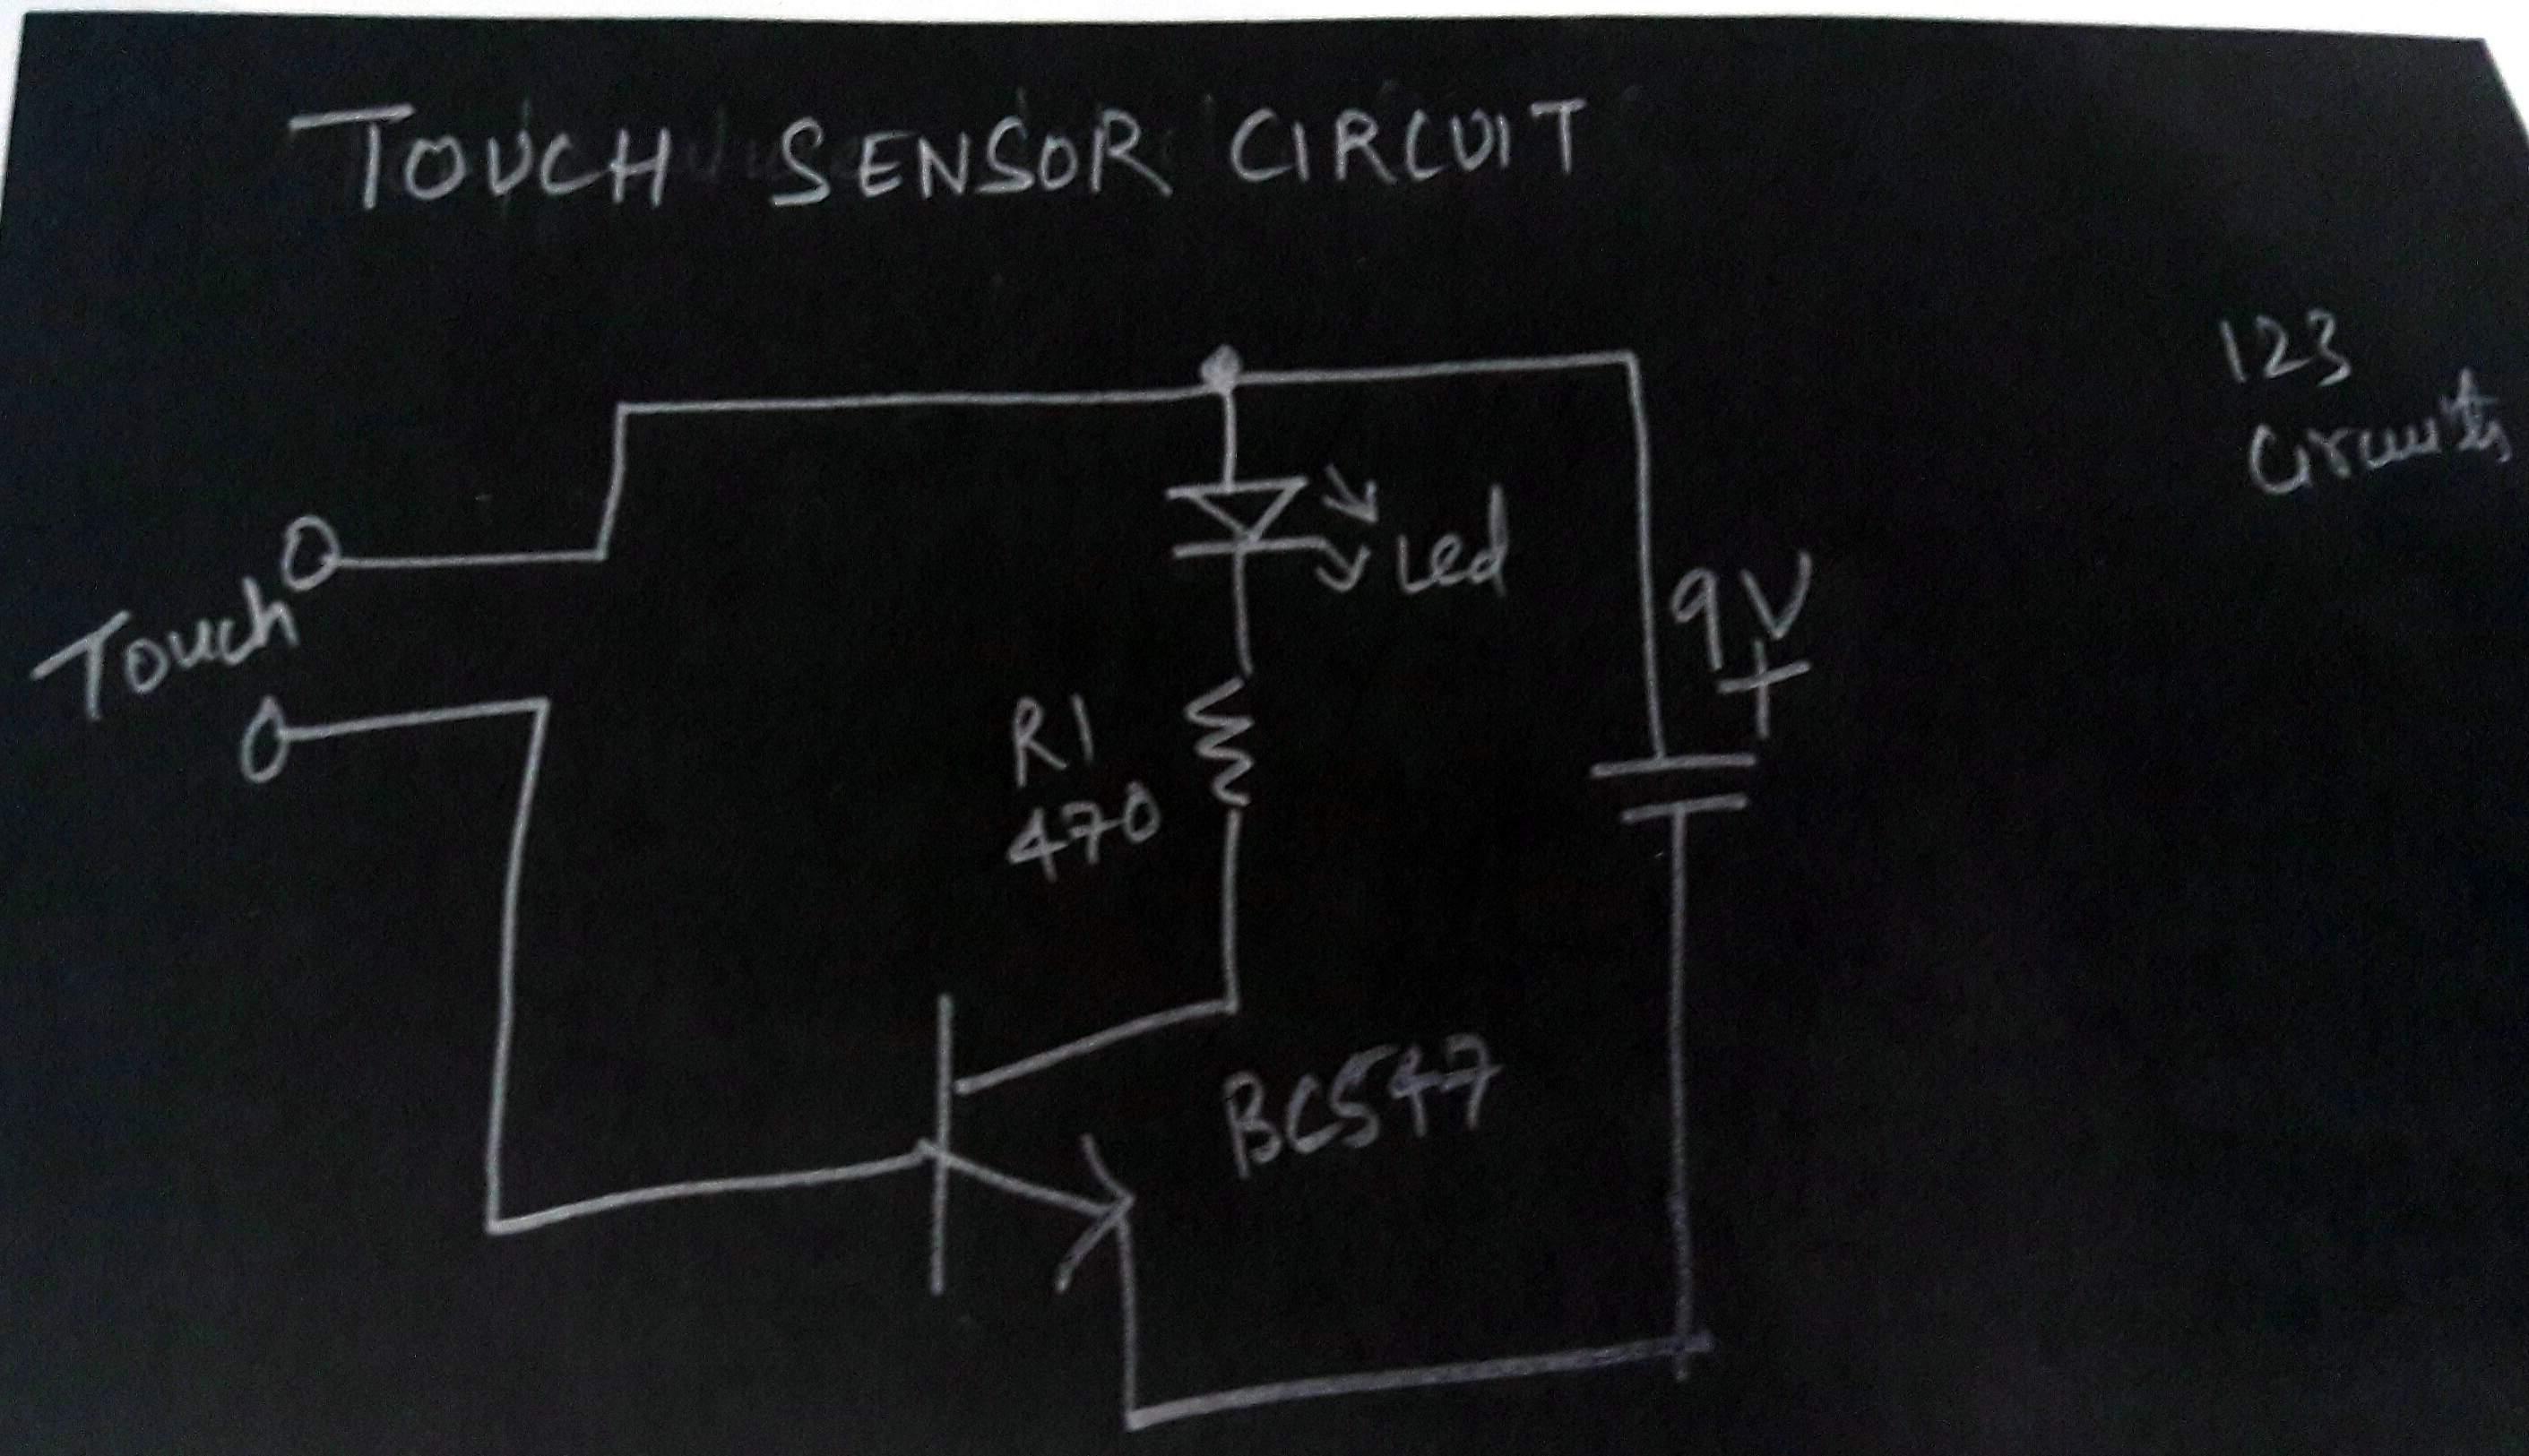 Electronics Tutorial Circuits Schematics Light Dark Sensor Circuit Rs232 Burglar Alarm Rain Detector Usb Charger Car Battery Monitor